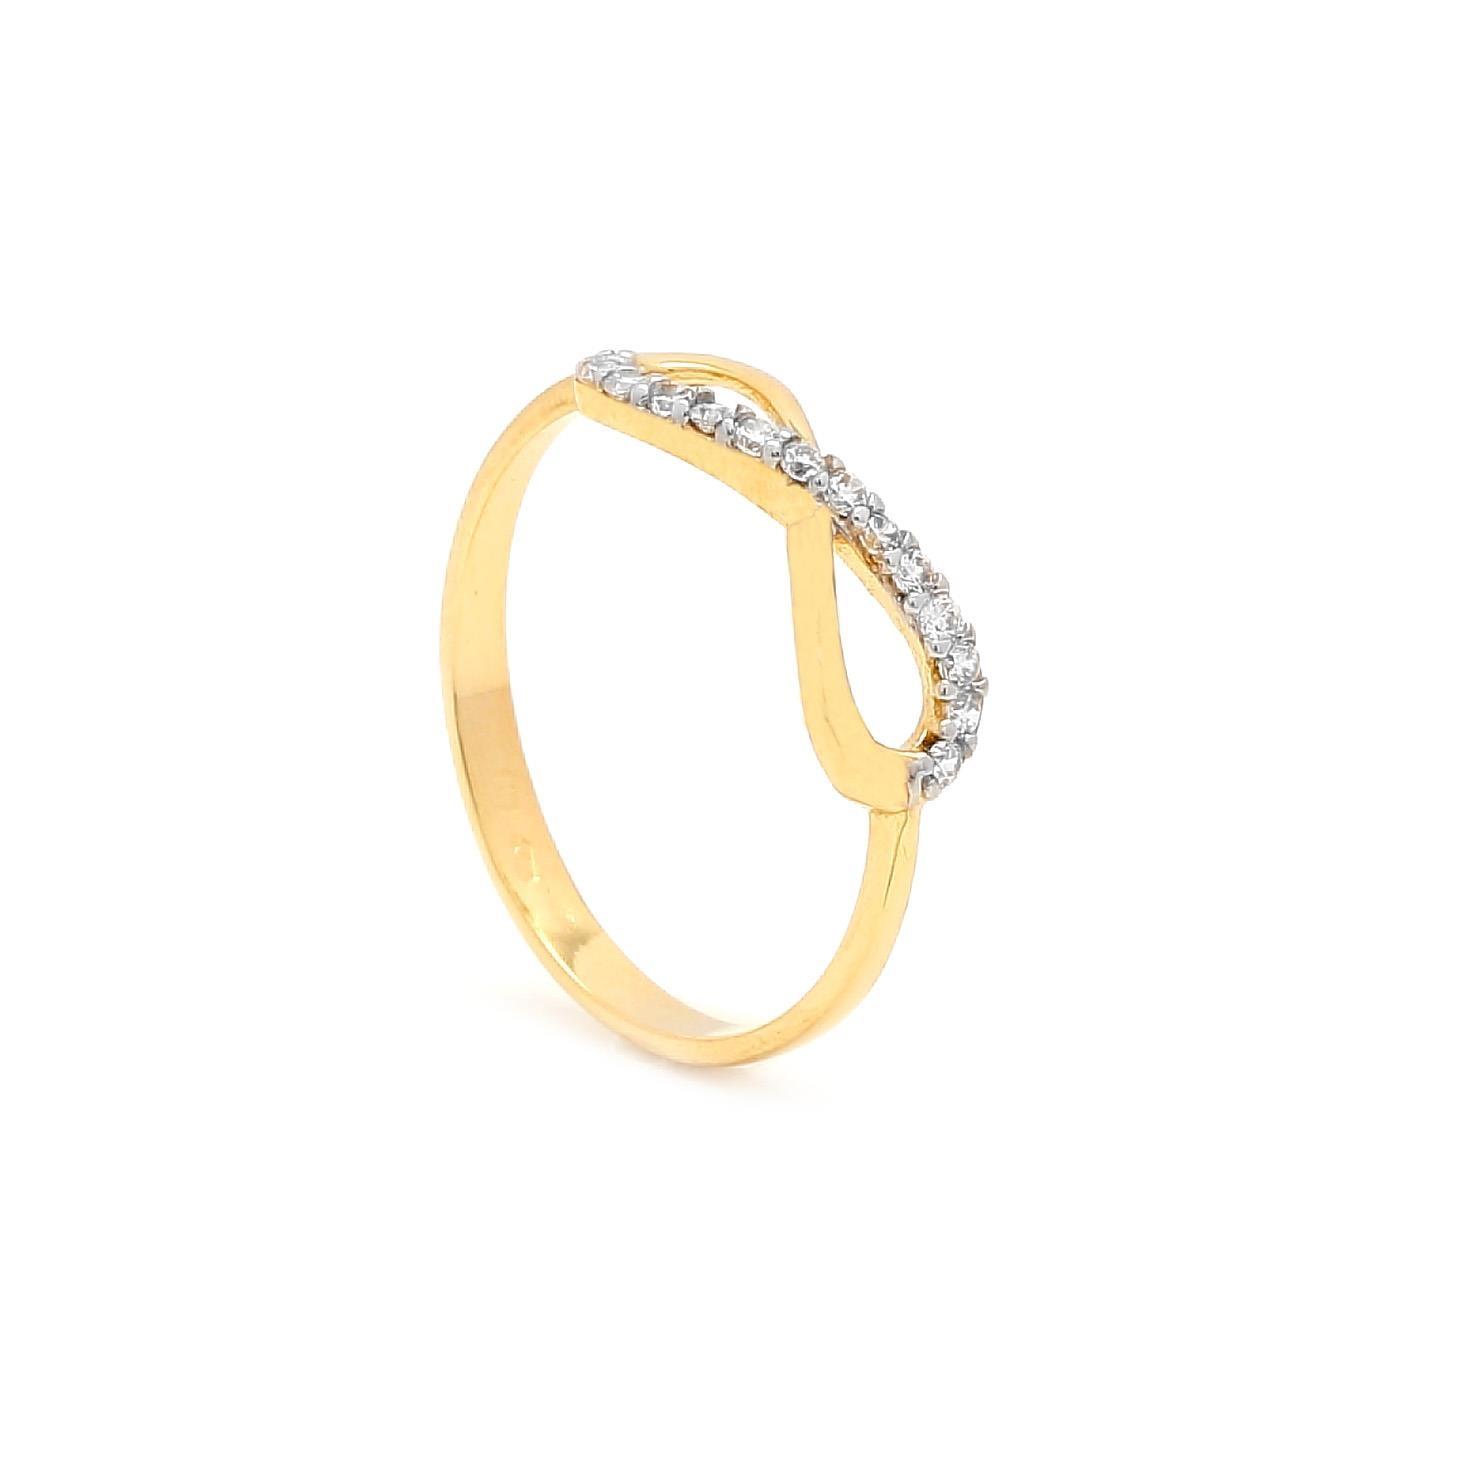 Zlatý prsteň NEKONEČNO